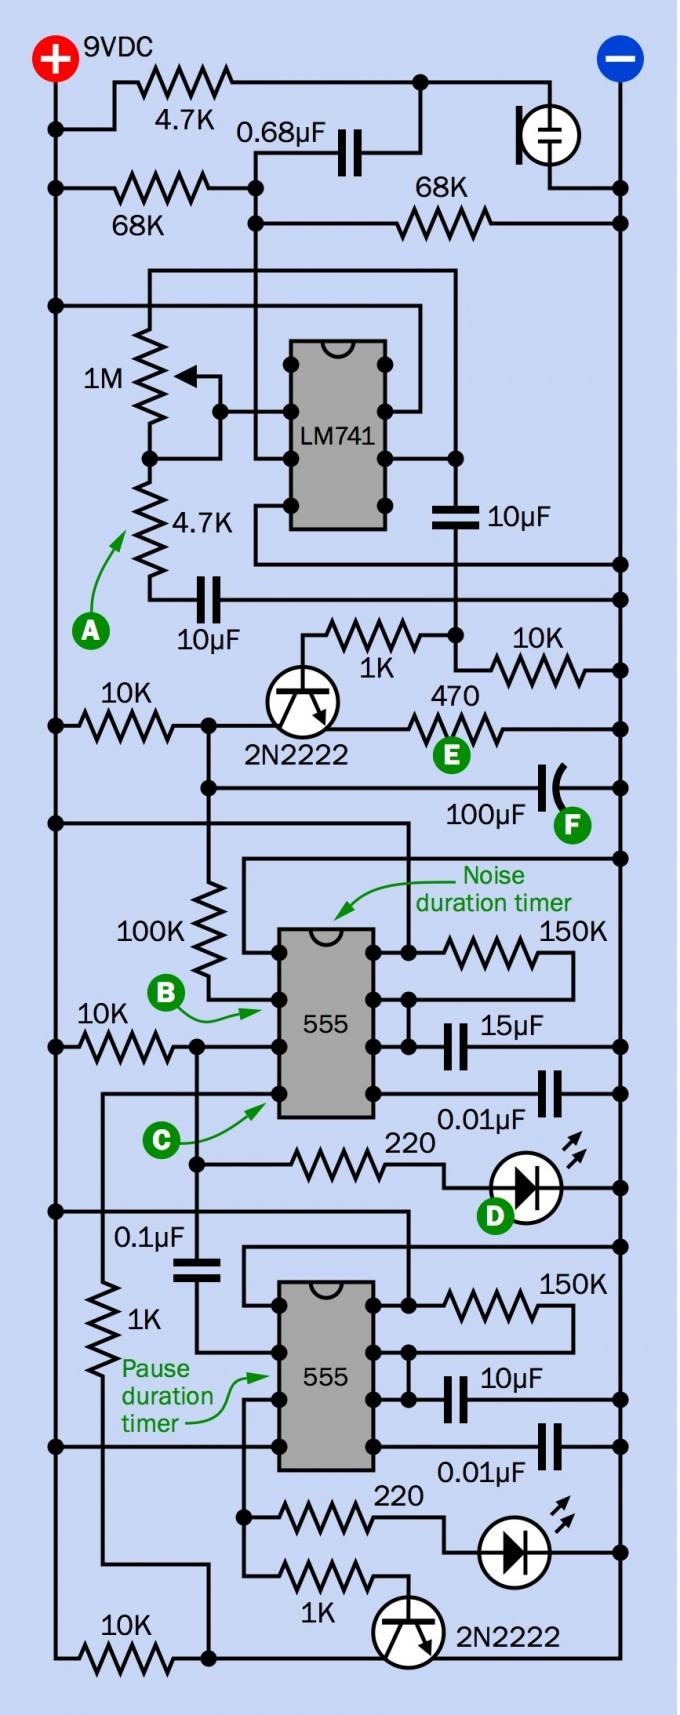 mme-schematic